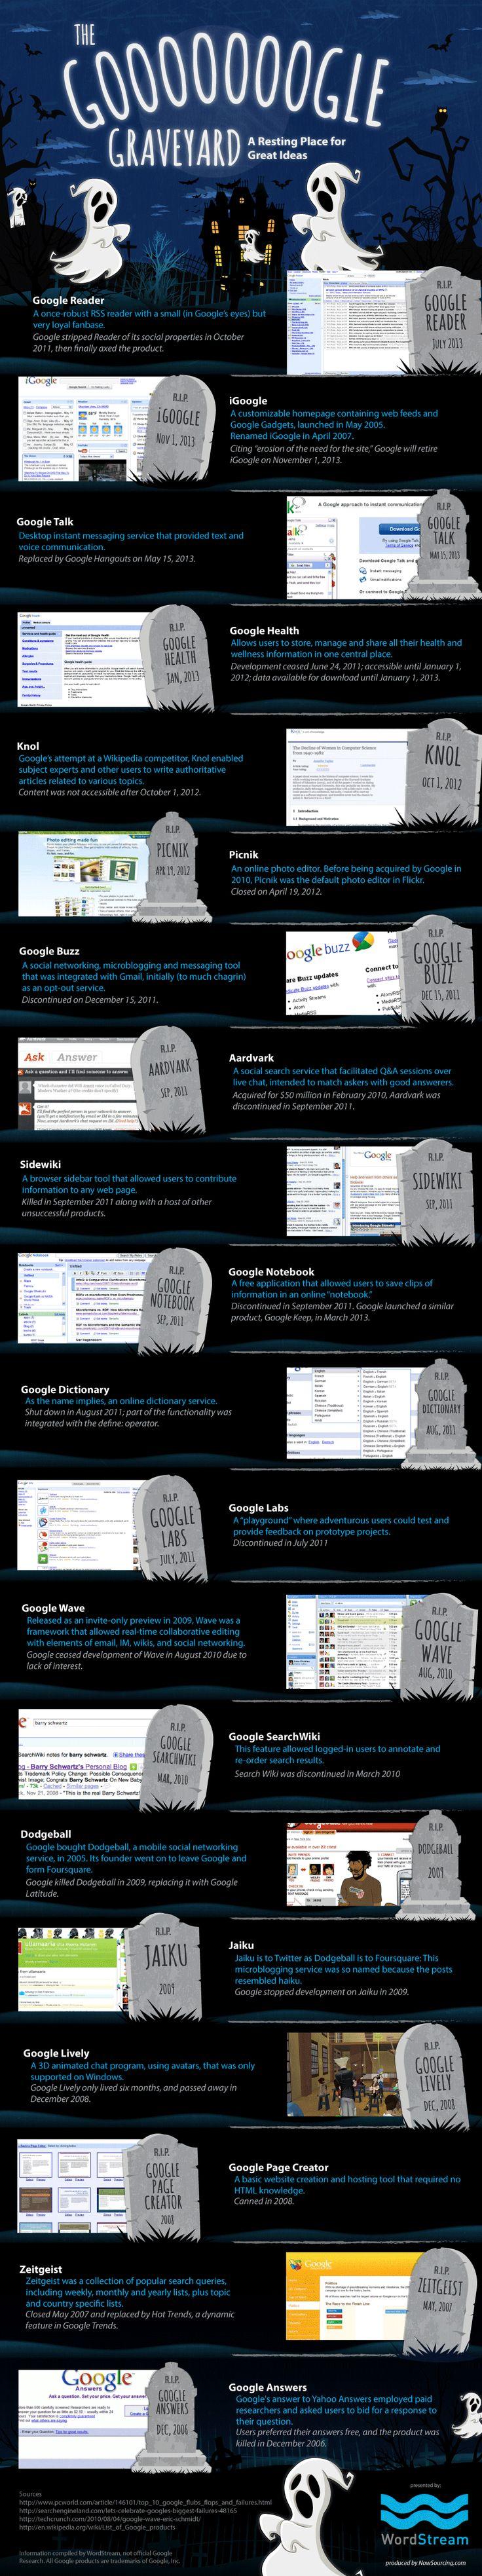 Cmentarz #Google [infografika]